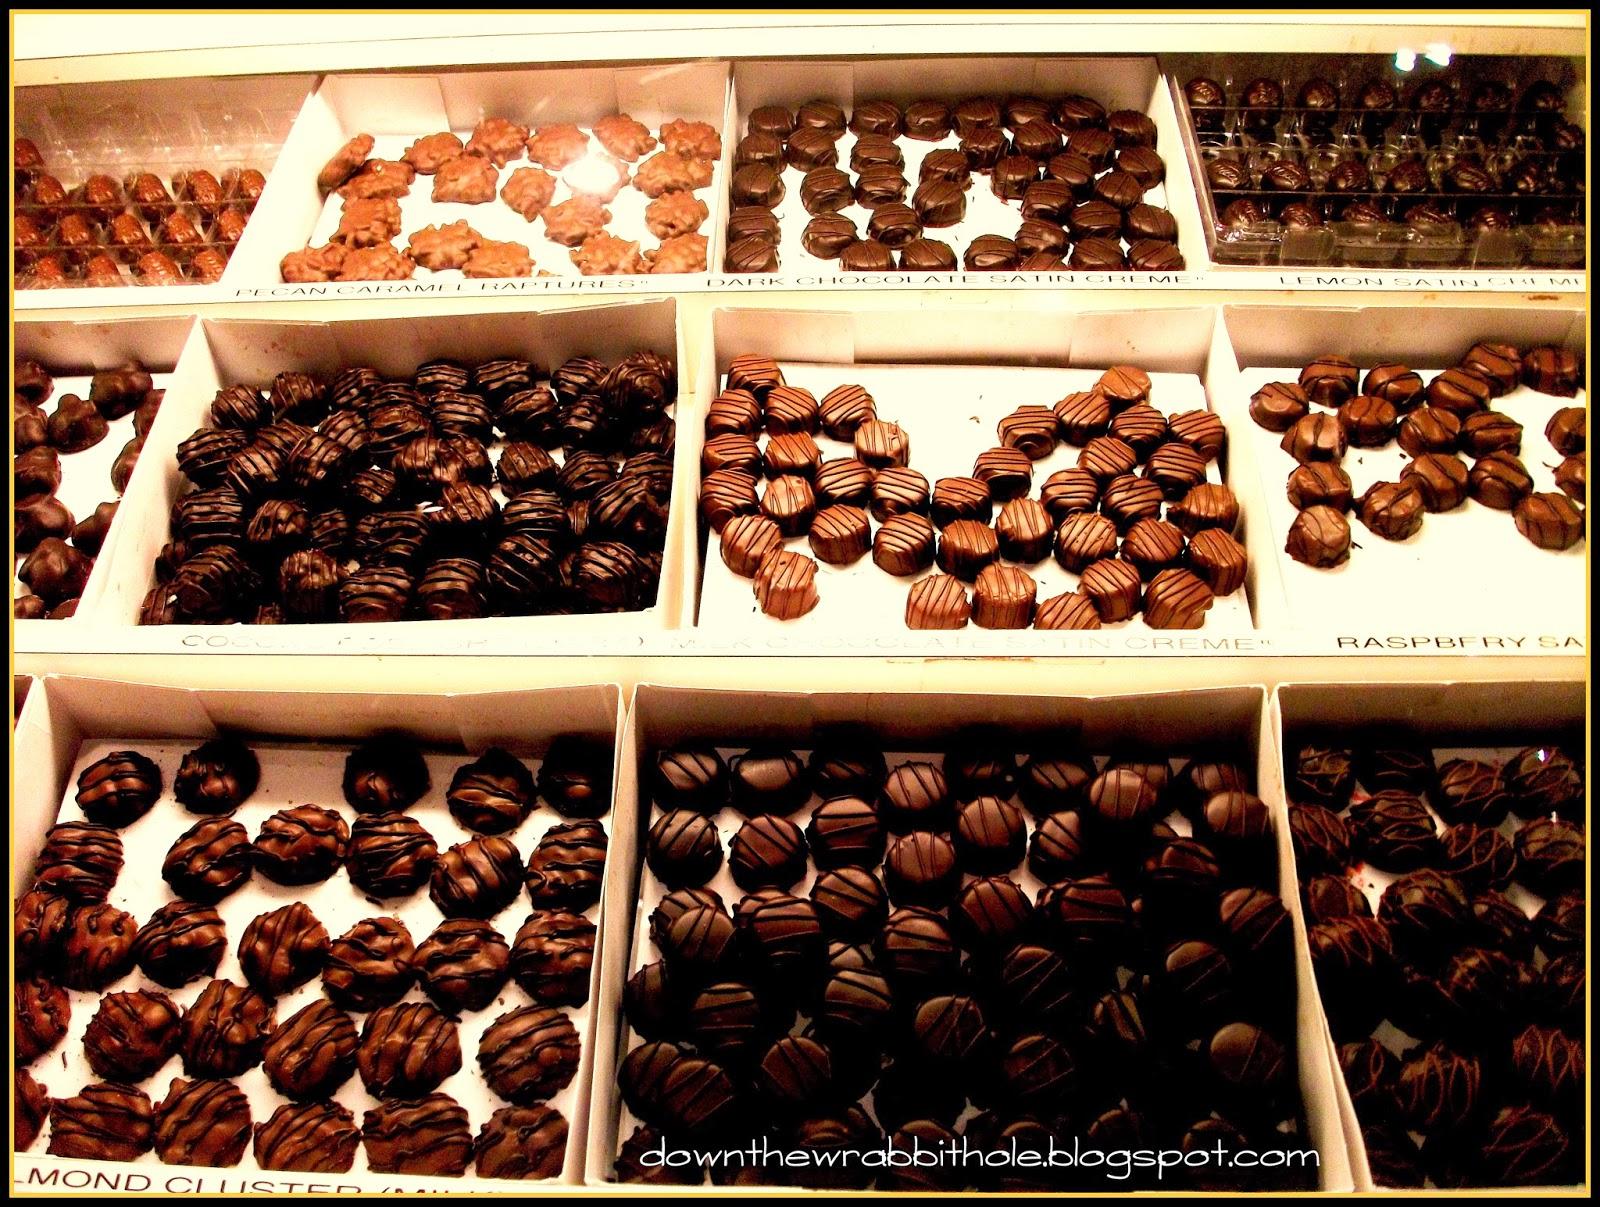 Visit a Cactus Garden in a Chocolate Factory